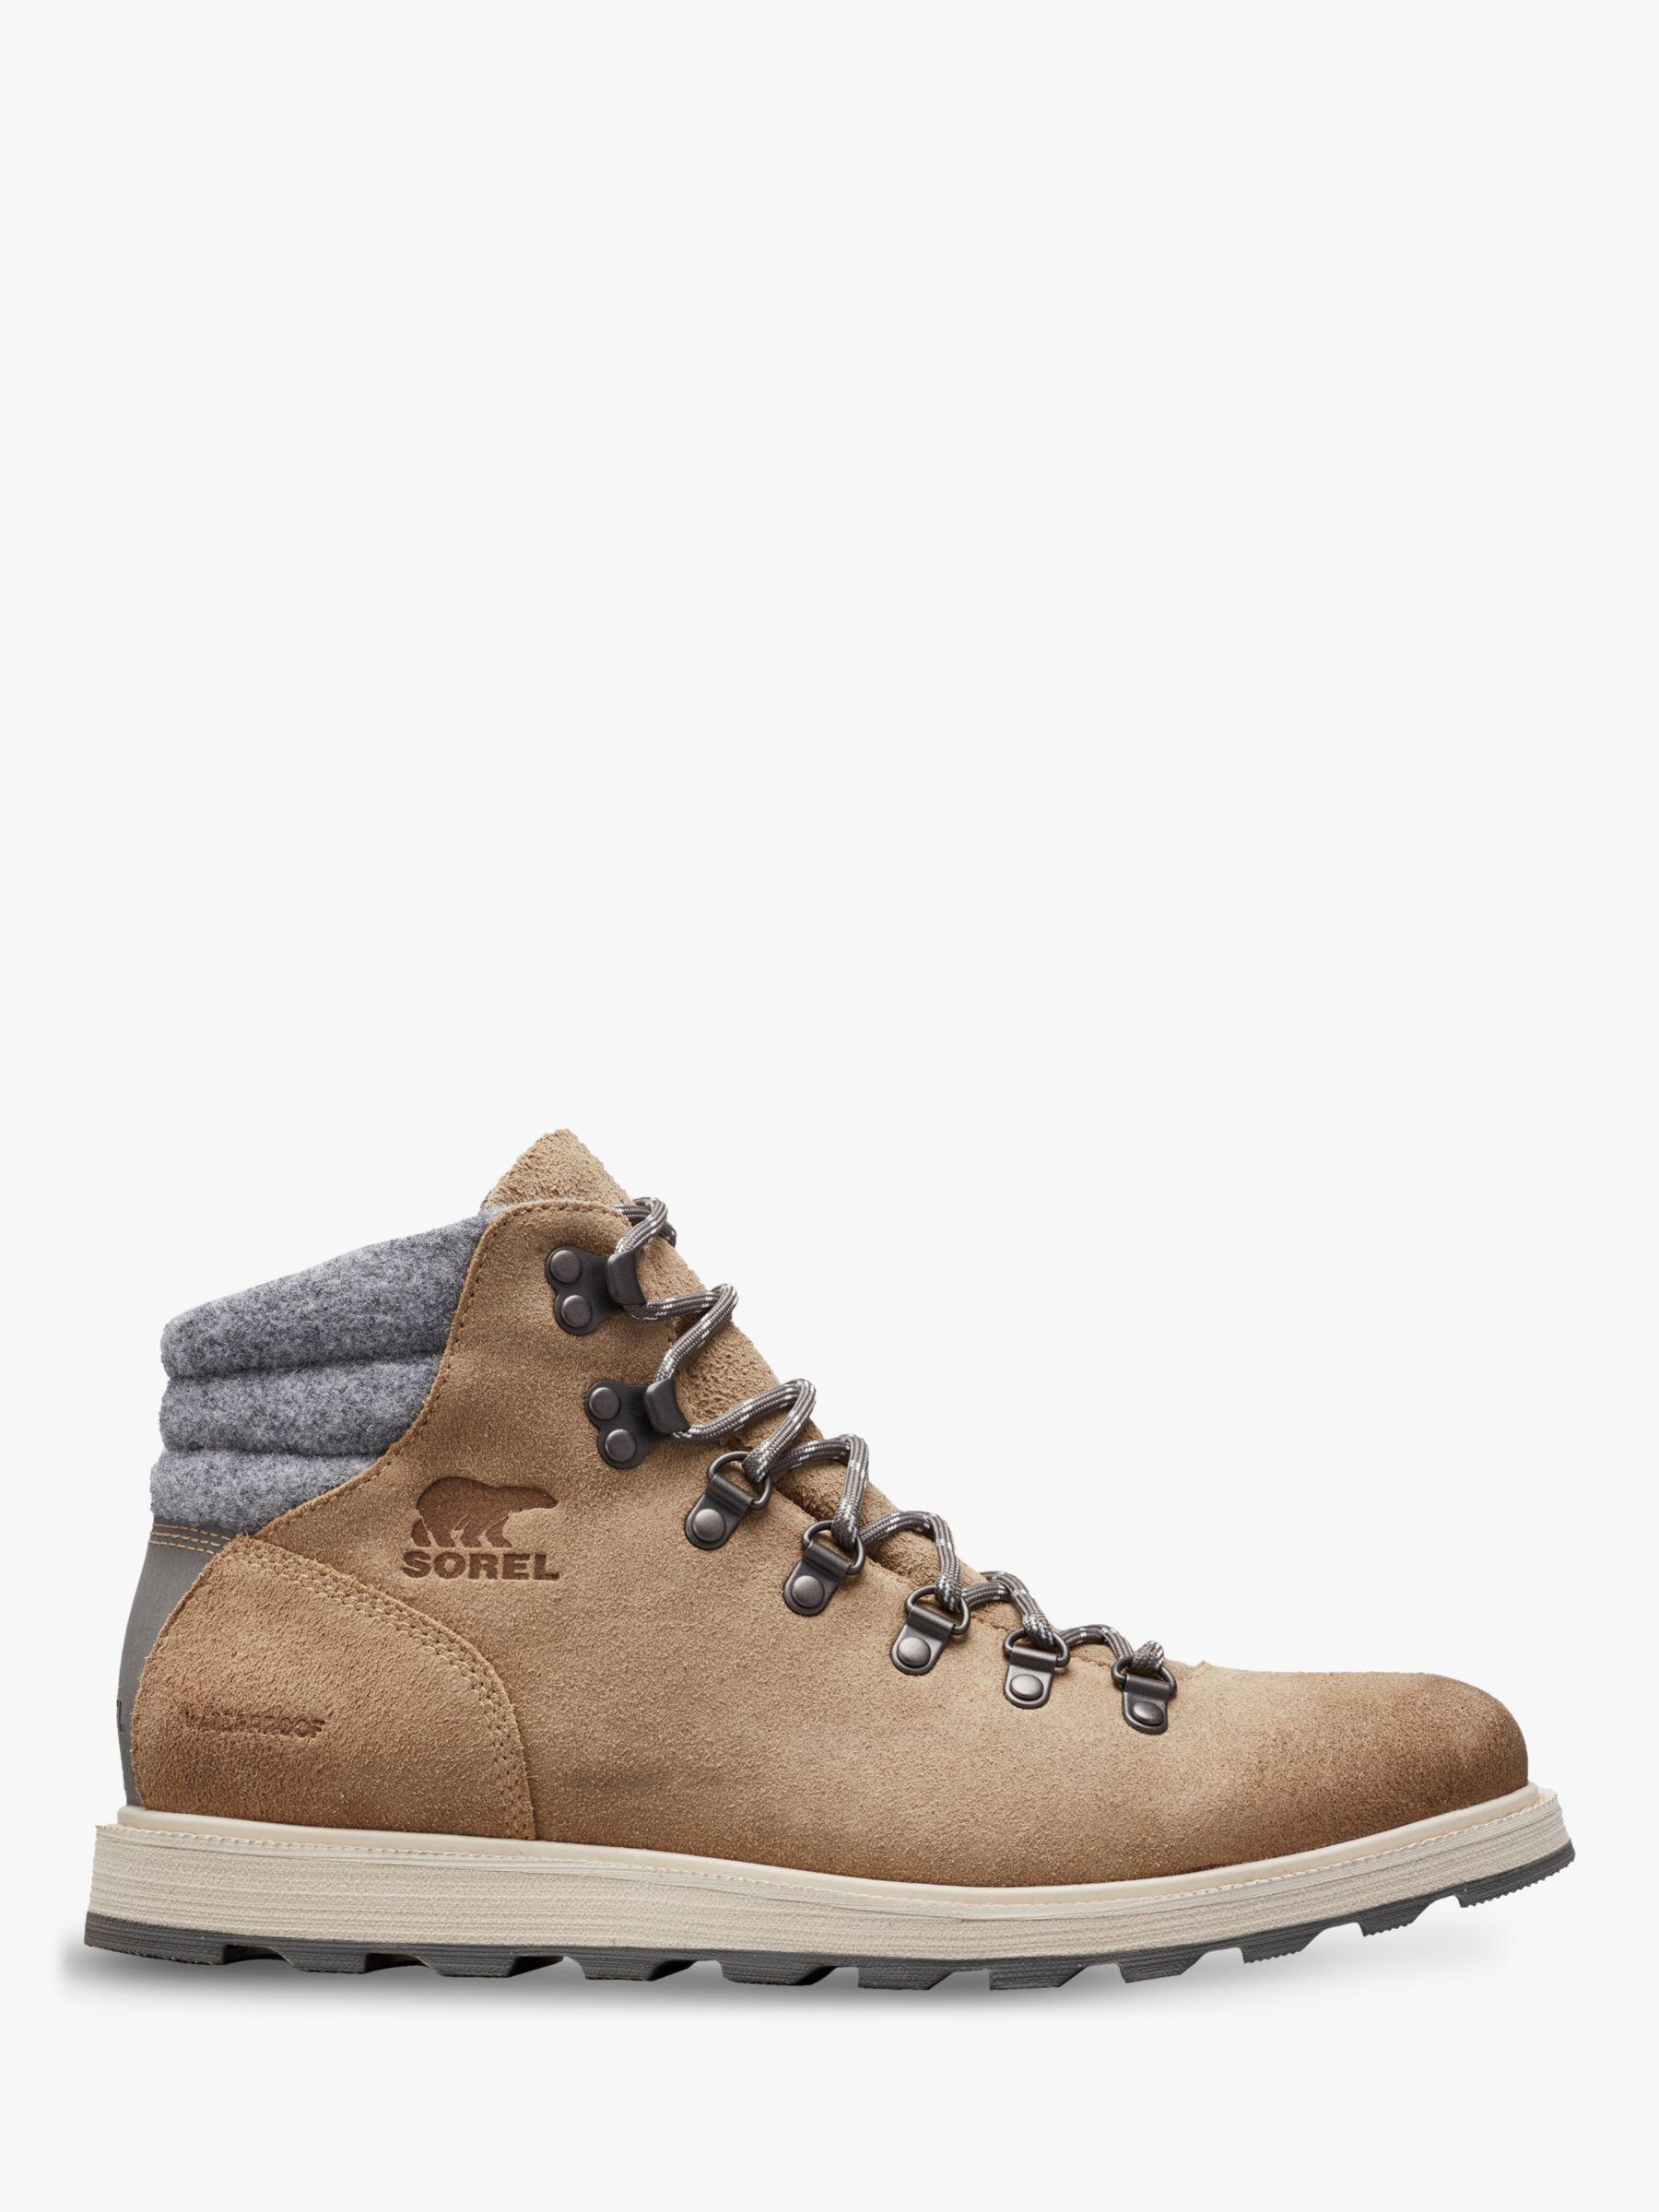 Sorel SOREL Madson Waterproof Hiker Boots, Oatmeal Quarry